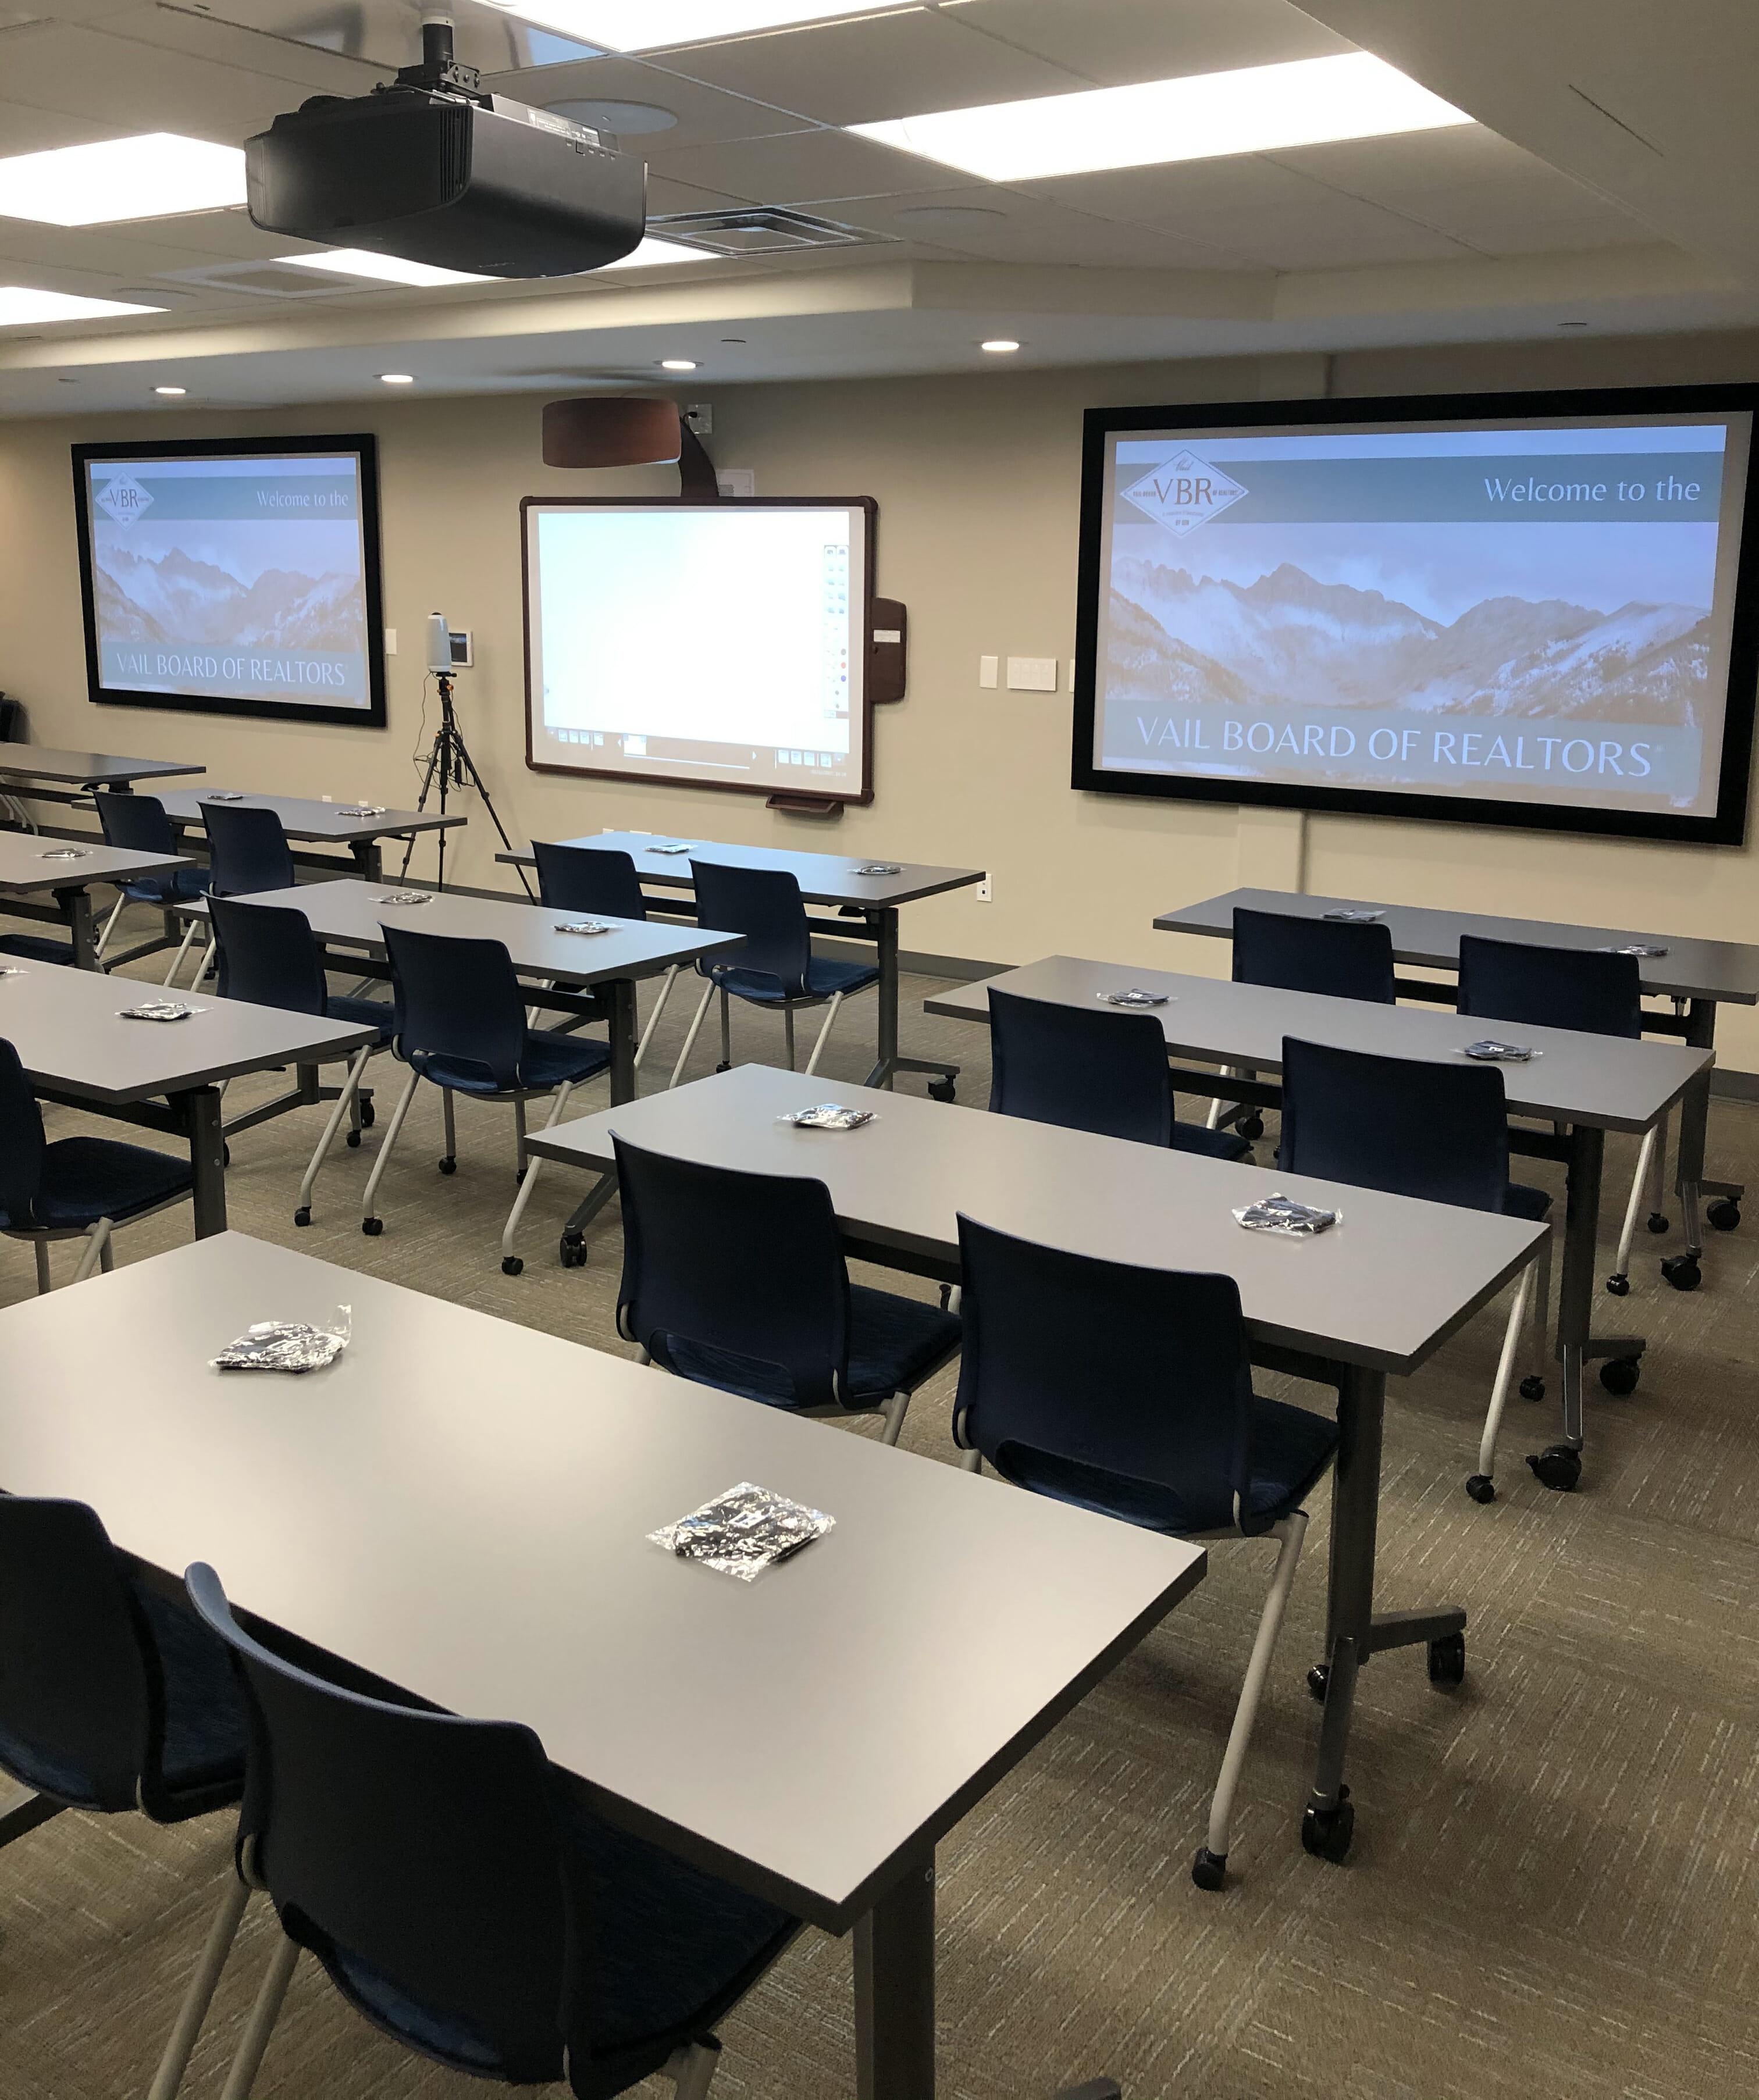 VBR Classroom